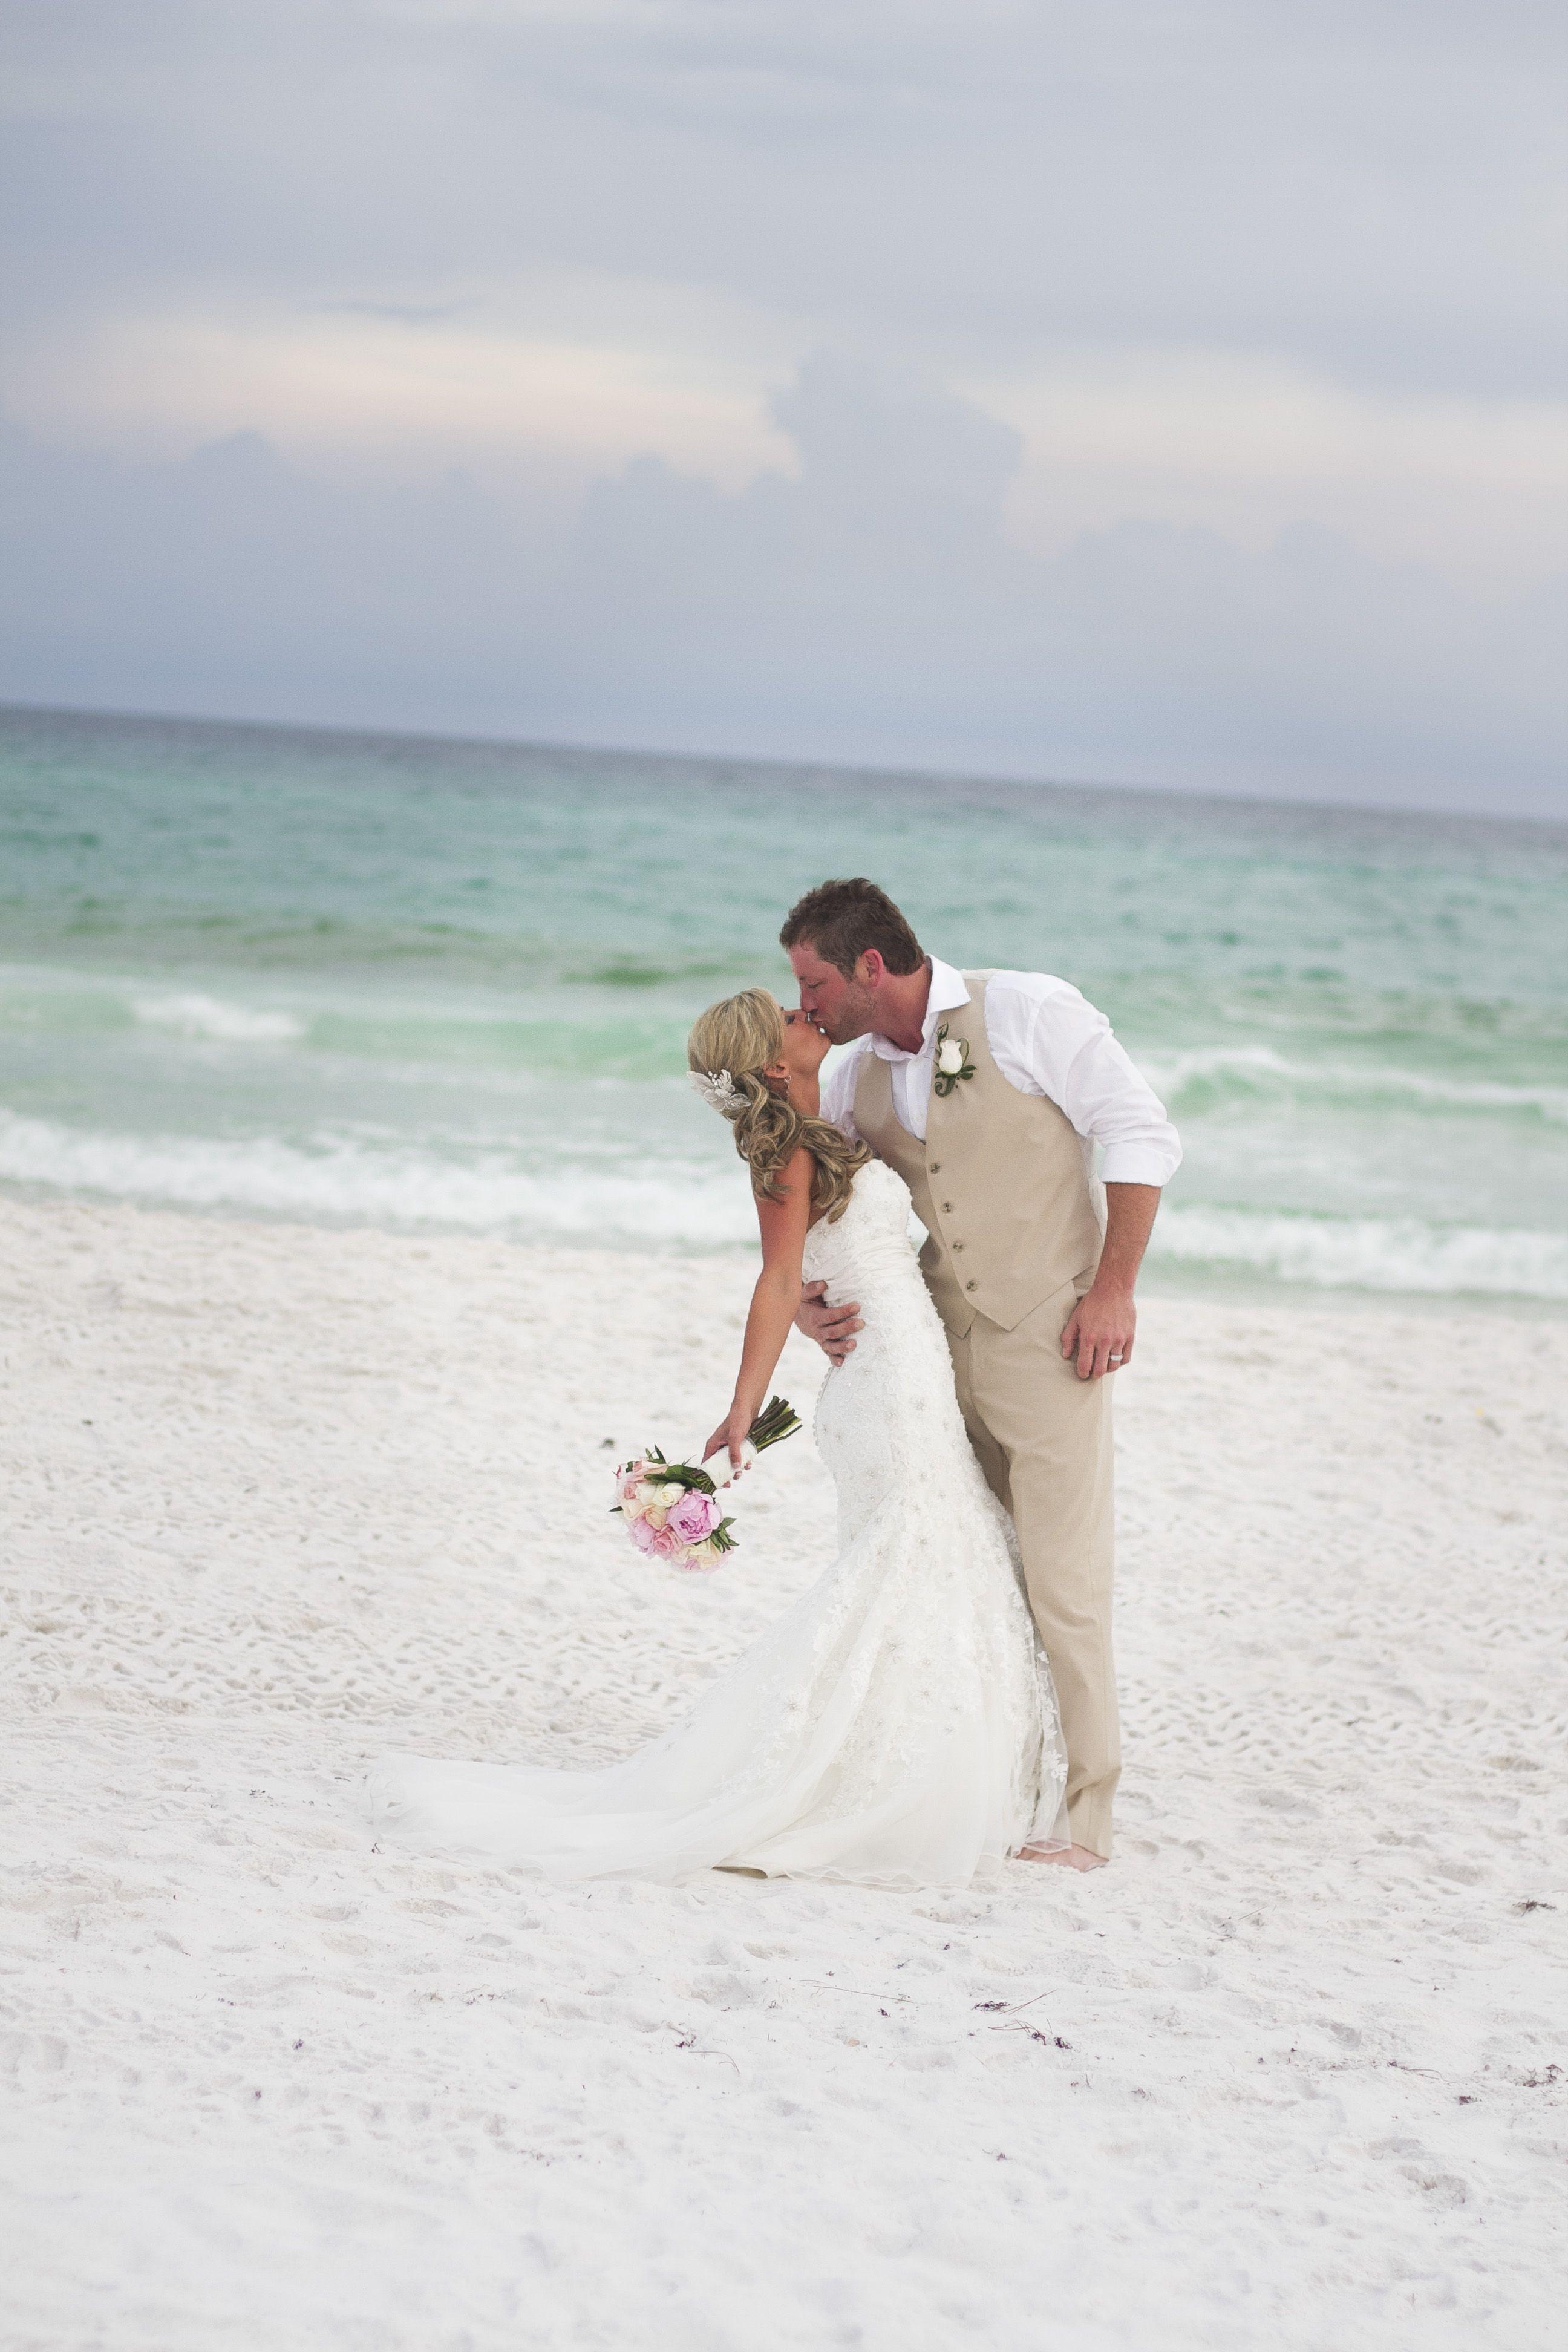 Beach Wedding - Destin, FL | My Beach Wedding | Pinterest | Beach ...